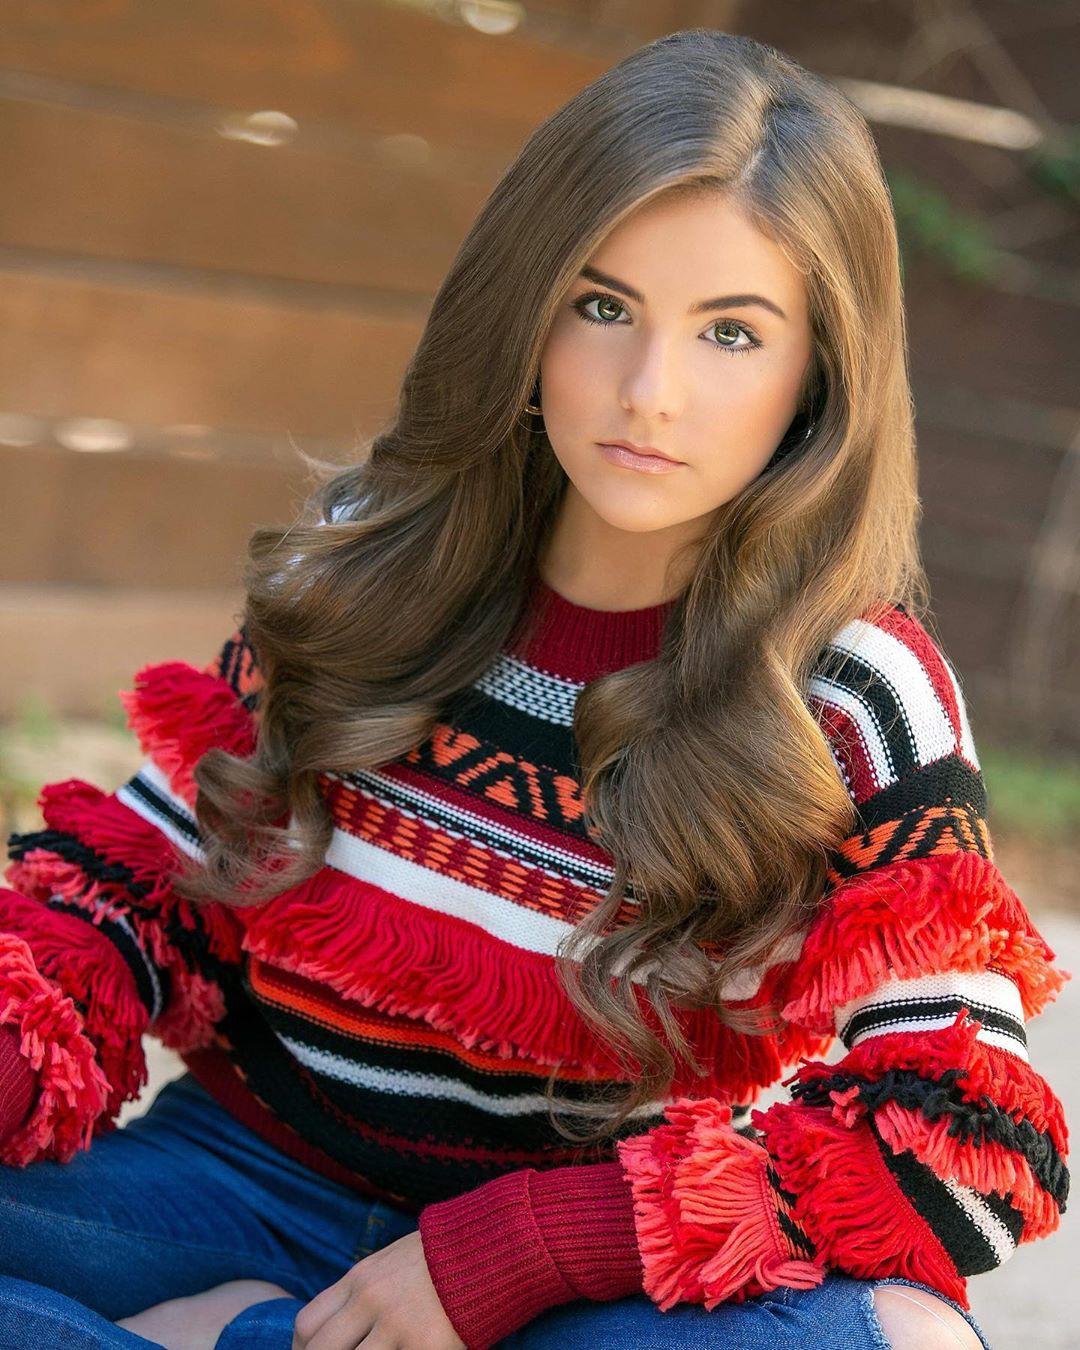 Piper Rockelle Face Makeup, Lip Makeup, Long Hair Style